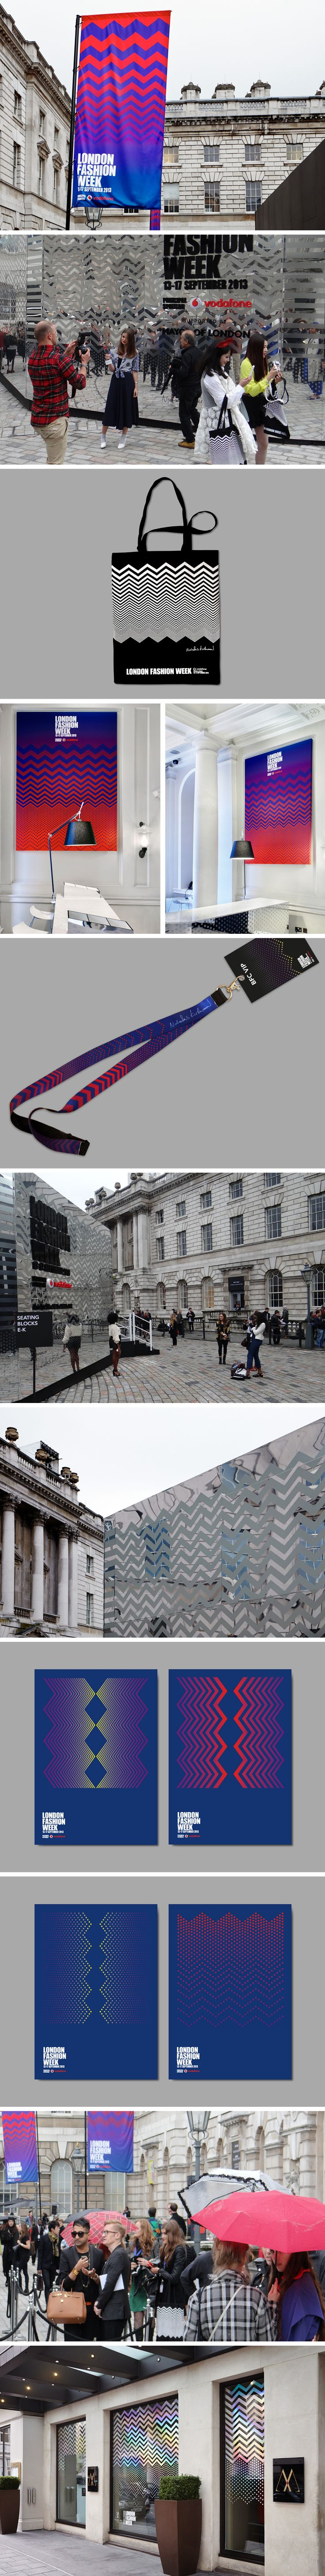 London fashion week – LFW/Nicholas Kirkwood Design Collateral  Client – British Fashion Council  Info –